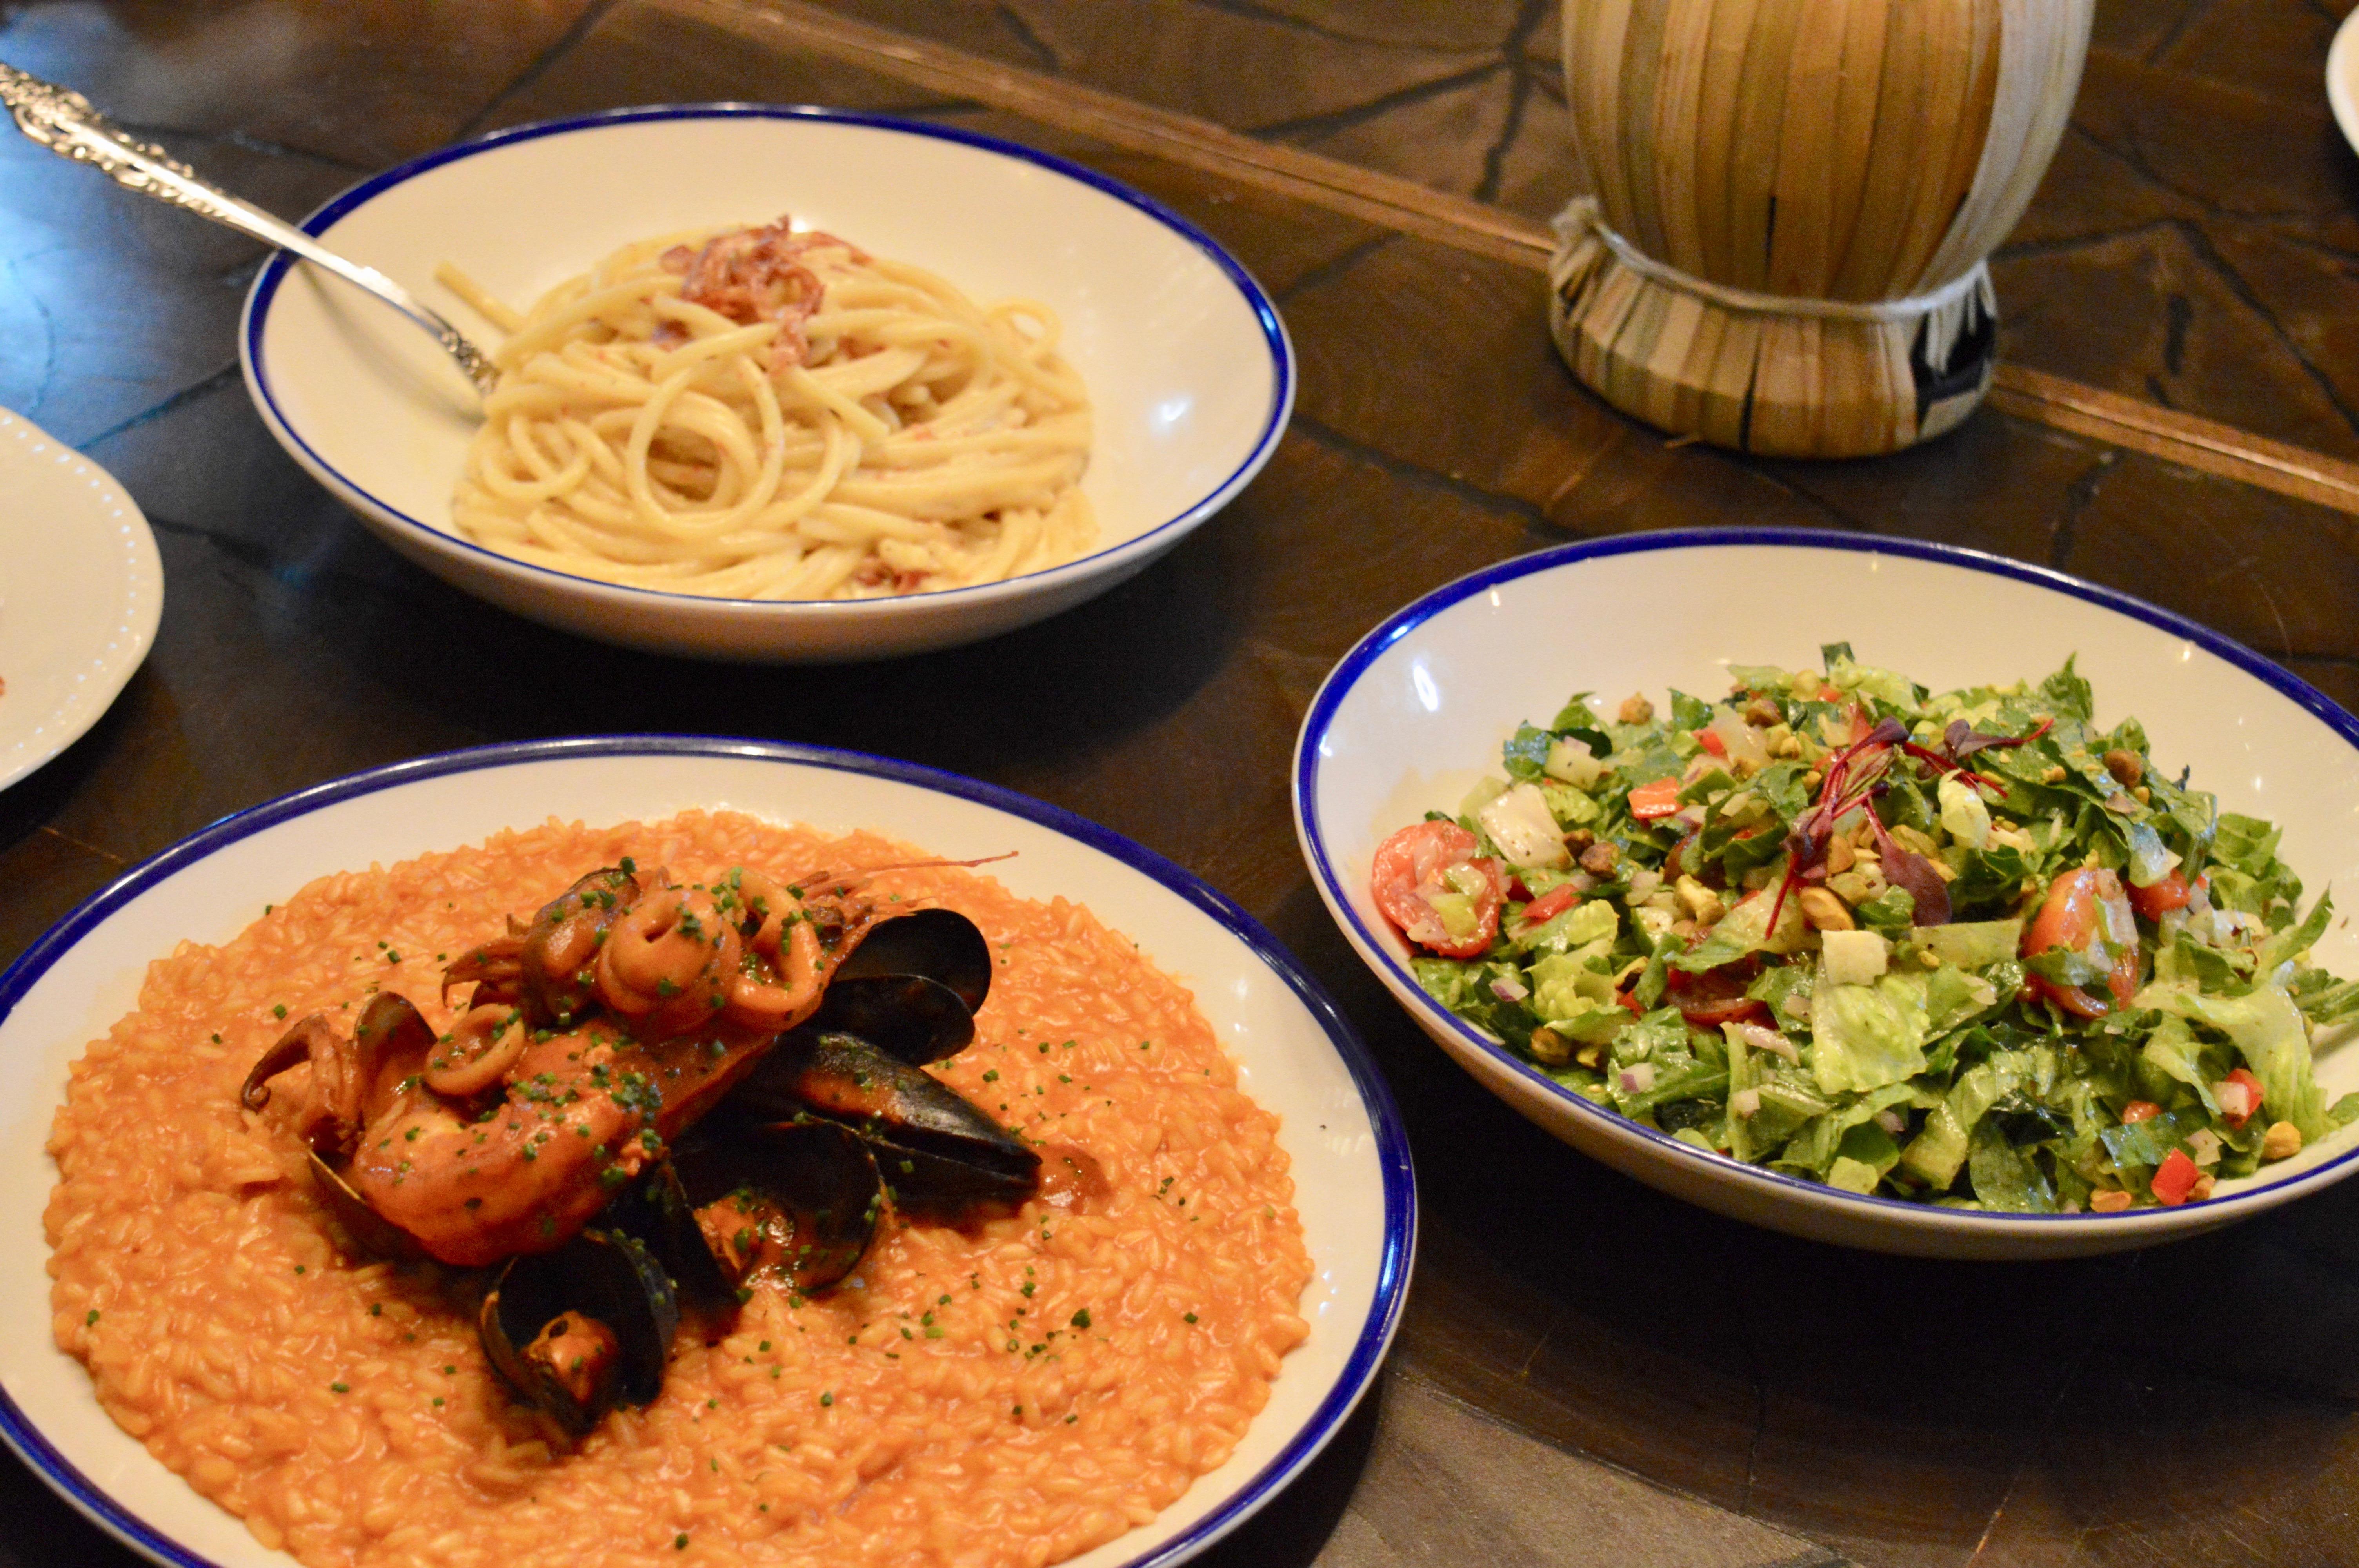 Chopped Salad Mercato Della Pescheria PostTurkey Day Thanksgiving Brunch | Italian dining served family style with the Las Vegas Influencers | The Venetian Las Vegas | Elle Blonde Luxury Lifestyle Destination Blog